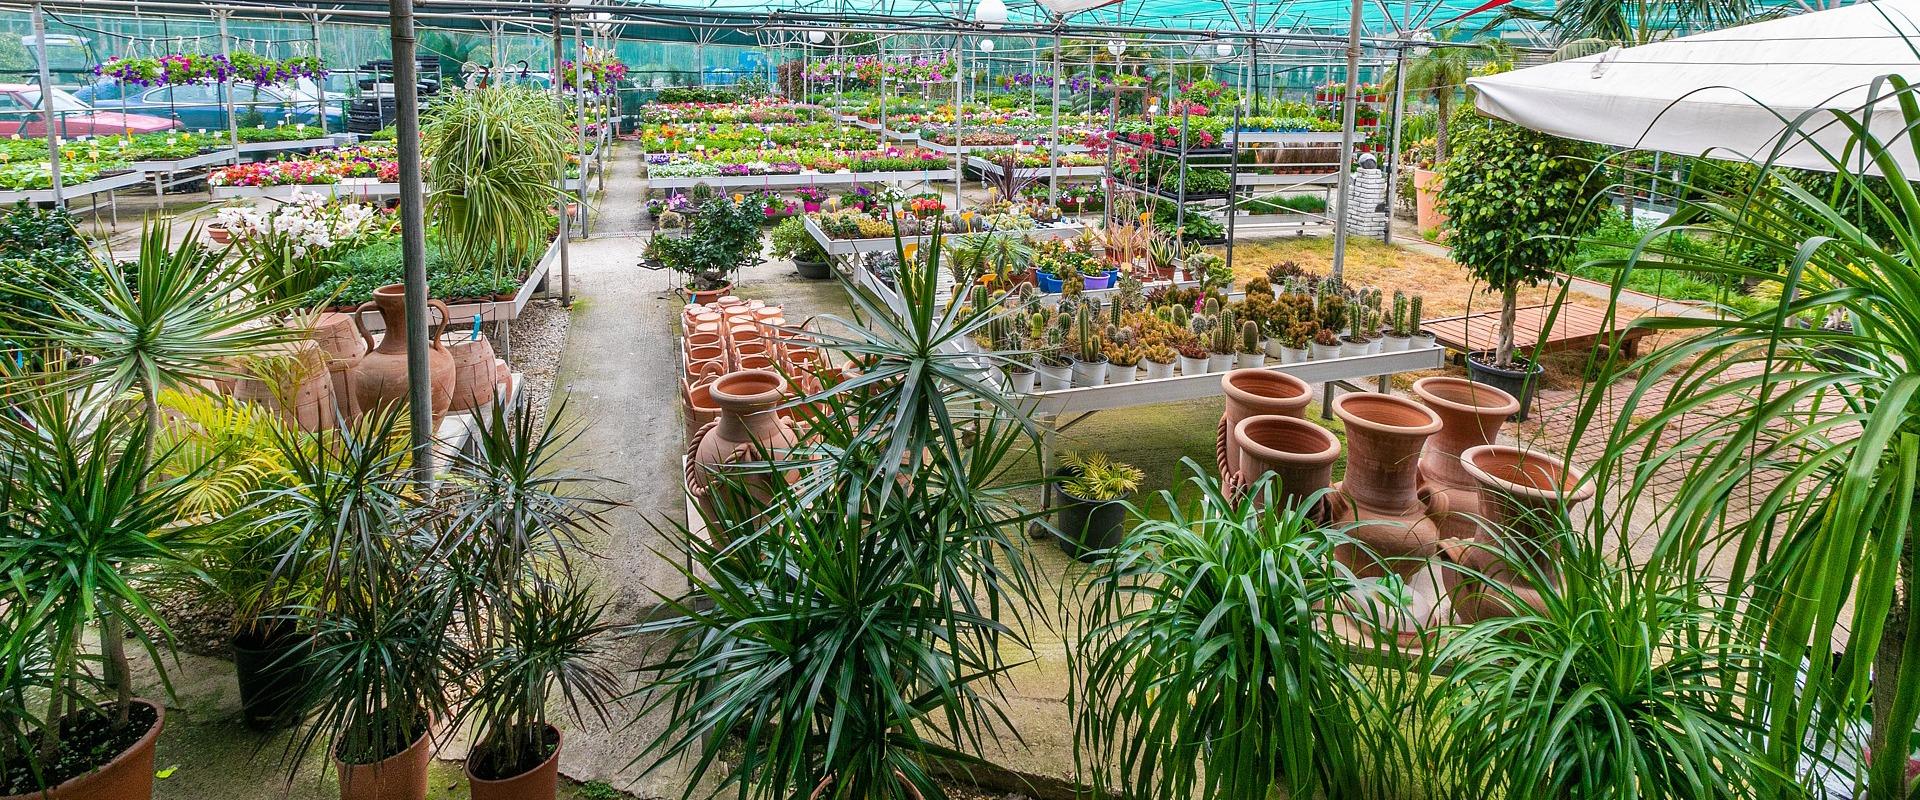 variety of plants garden center Chania, Crete